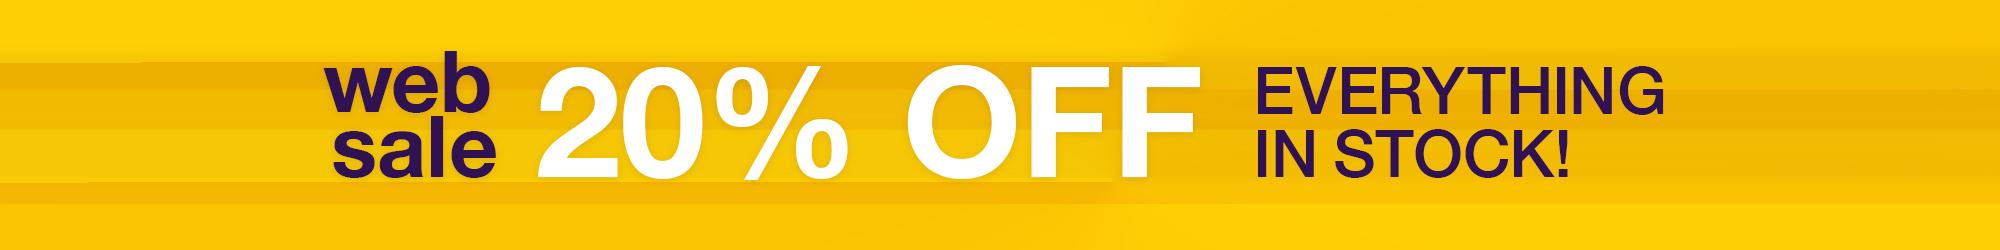 20% Off Web Sale Mon 18th - Thu 21st March 2019